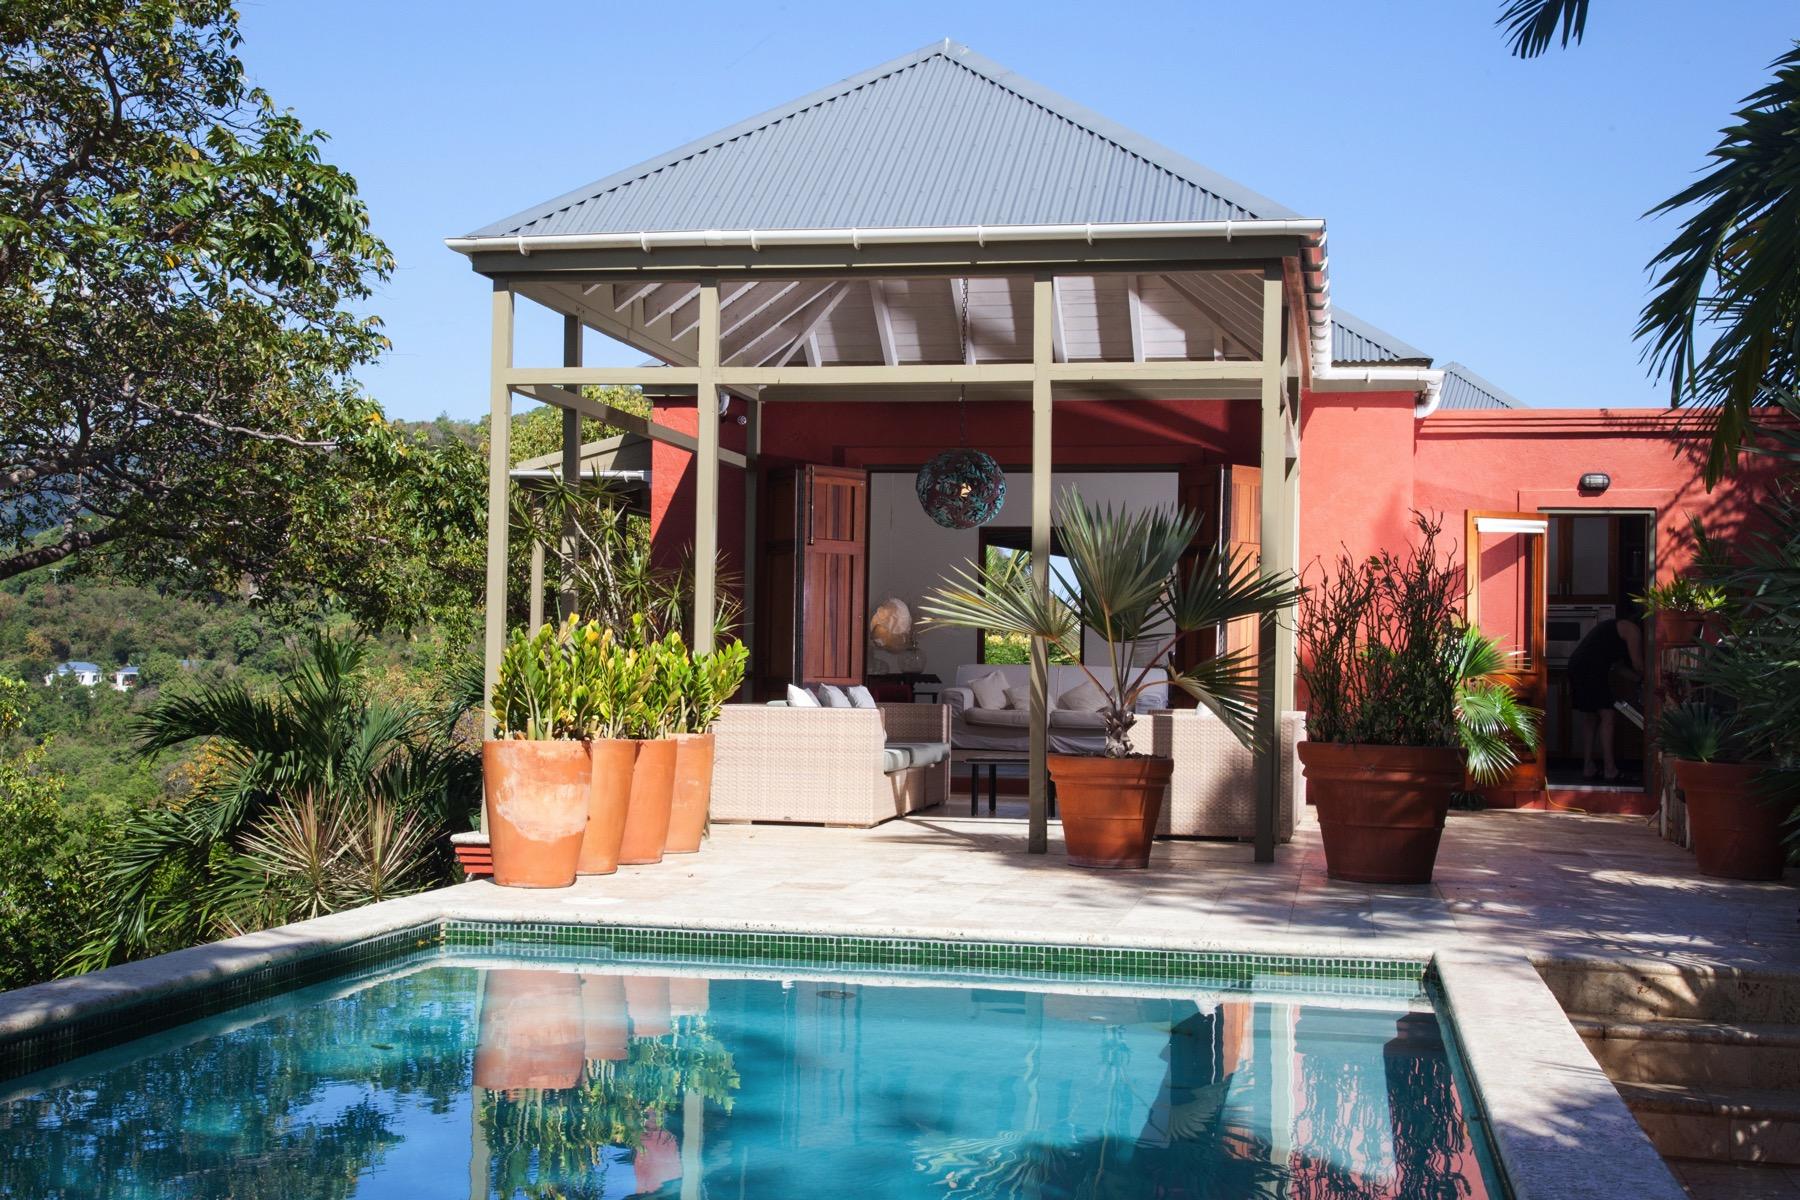 Single Family Home for Sale at Doveland Belmont, British Virgin Islands